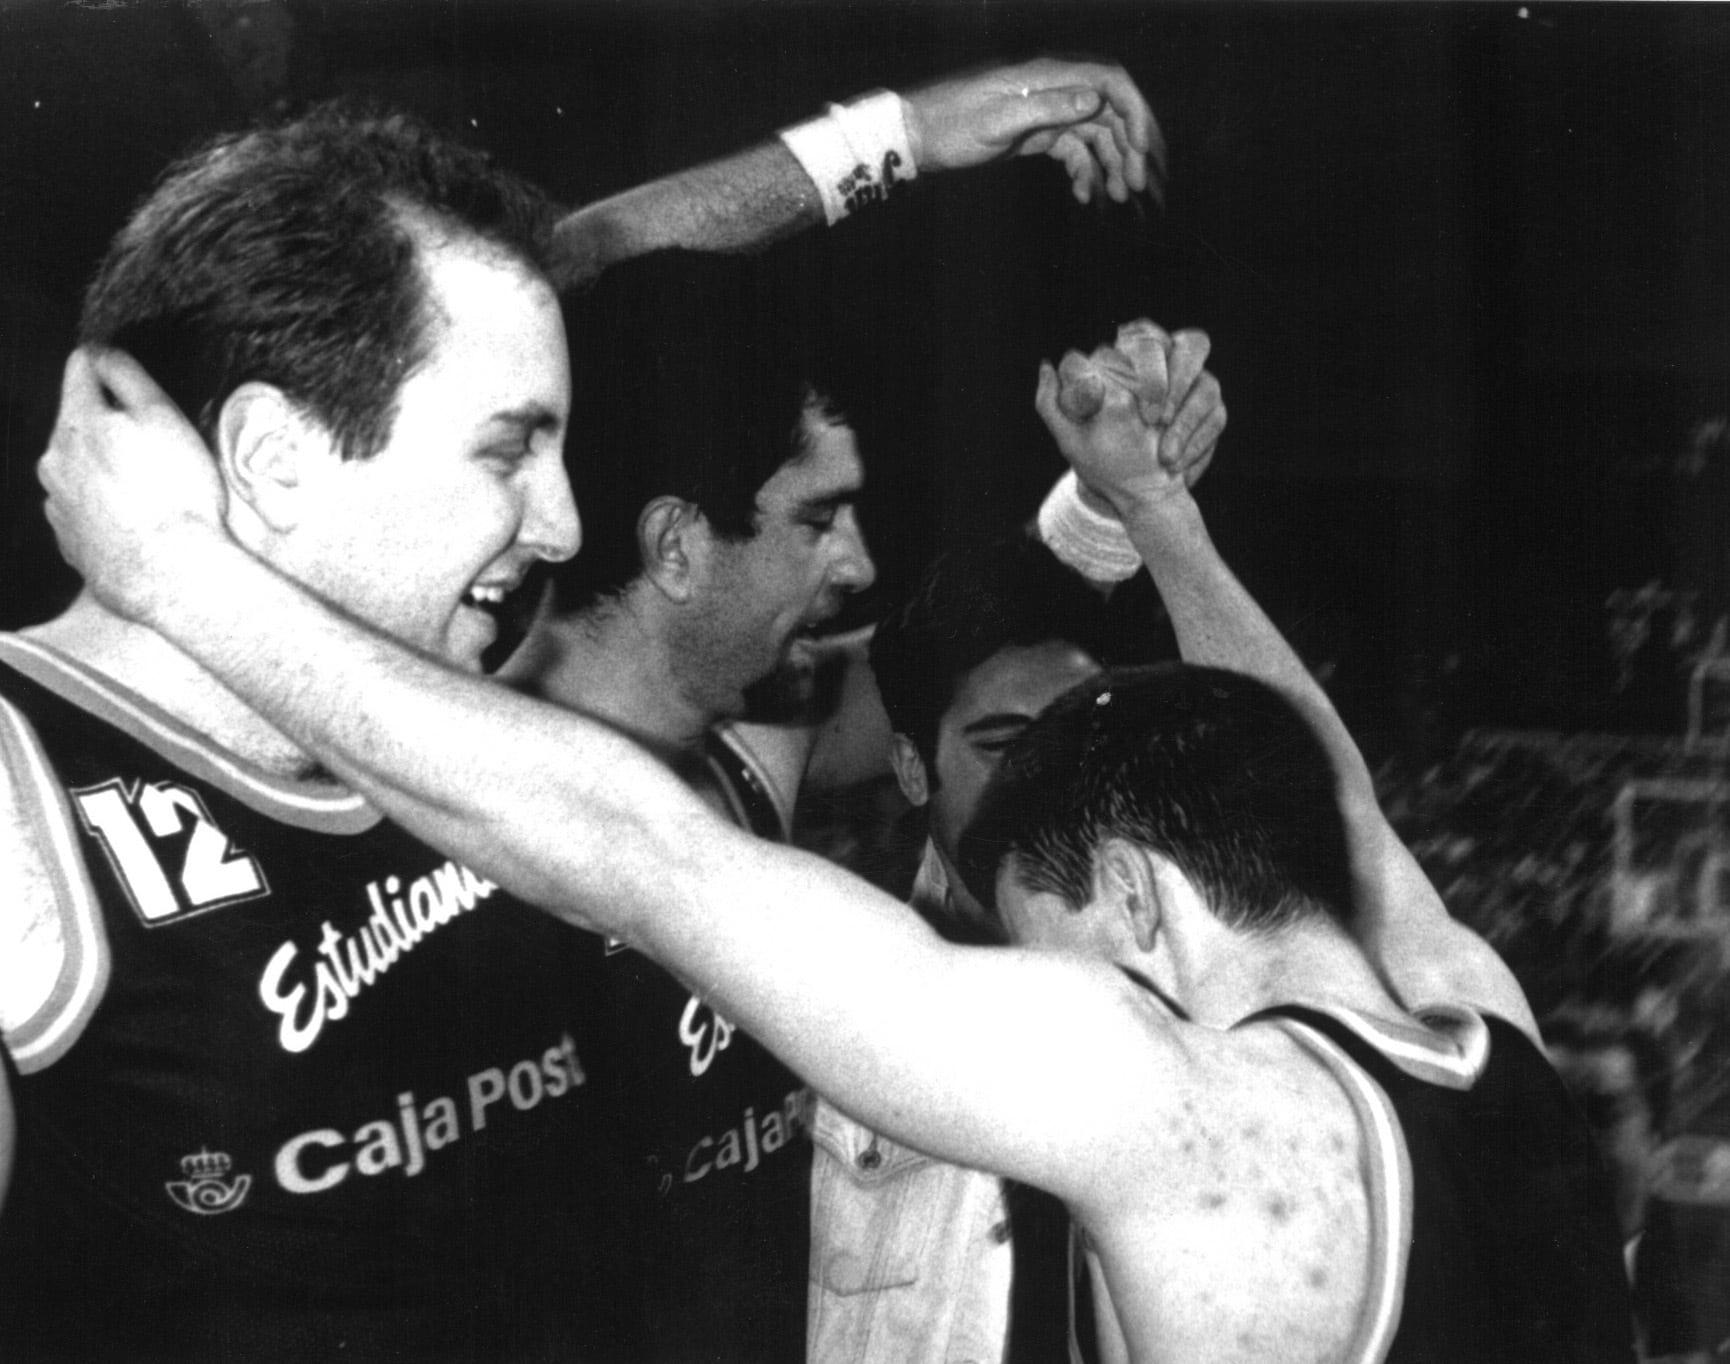 Estudiantes campeón chim-pum (Guillermo Ortiz)